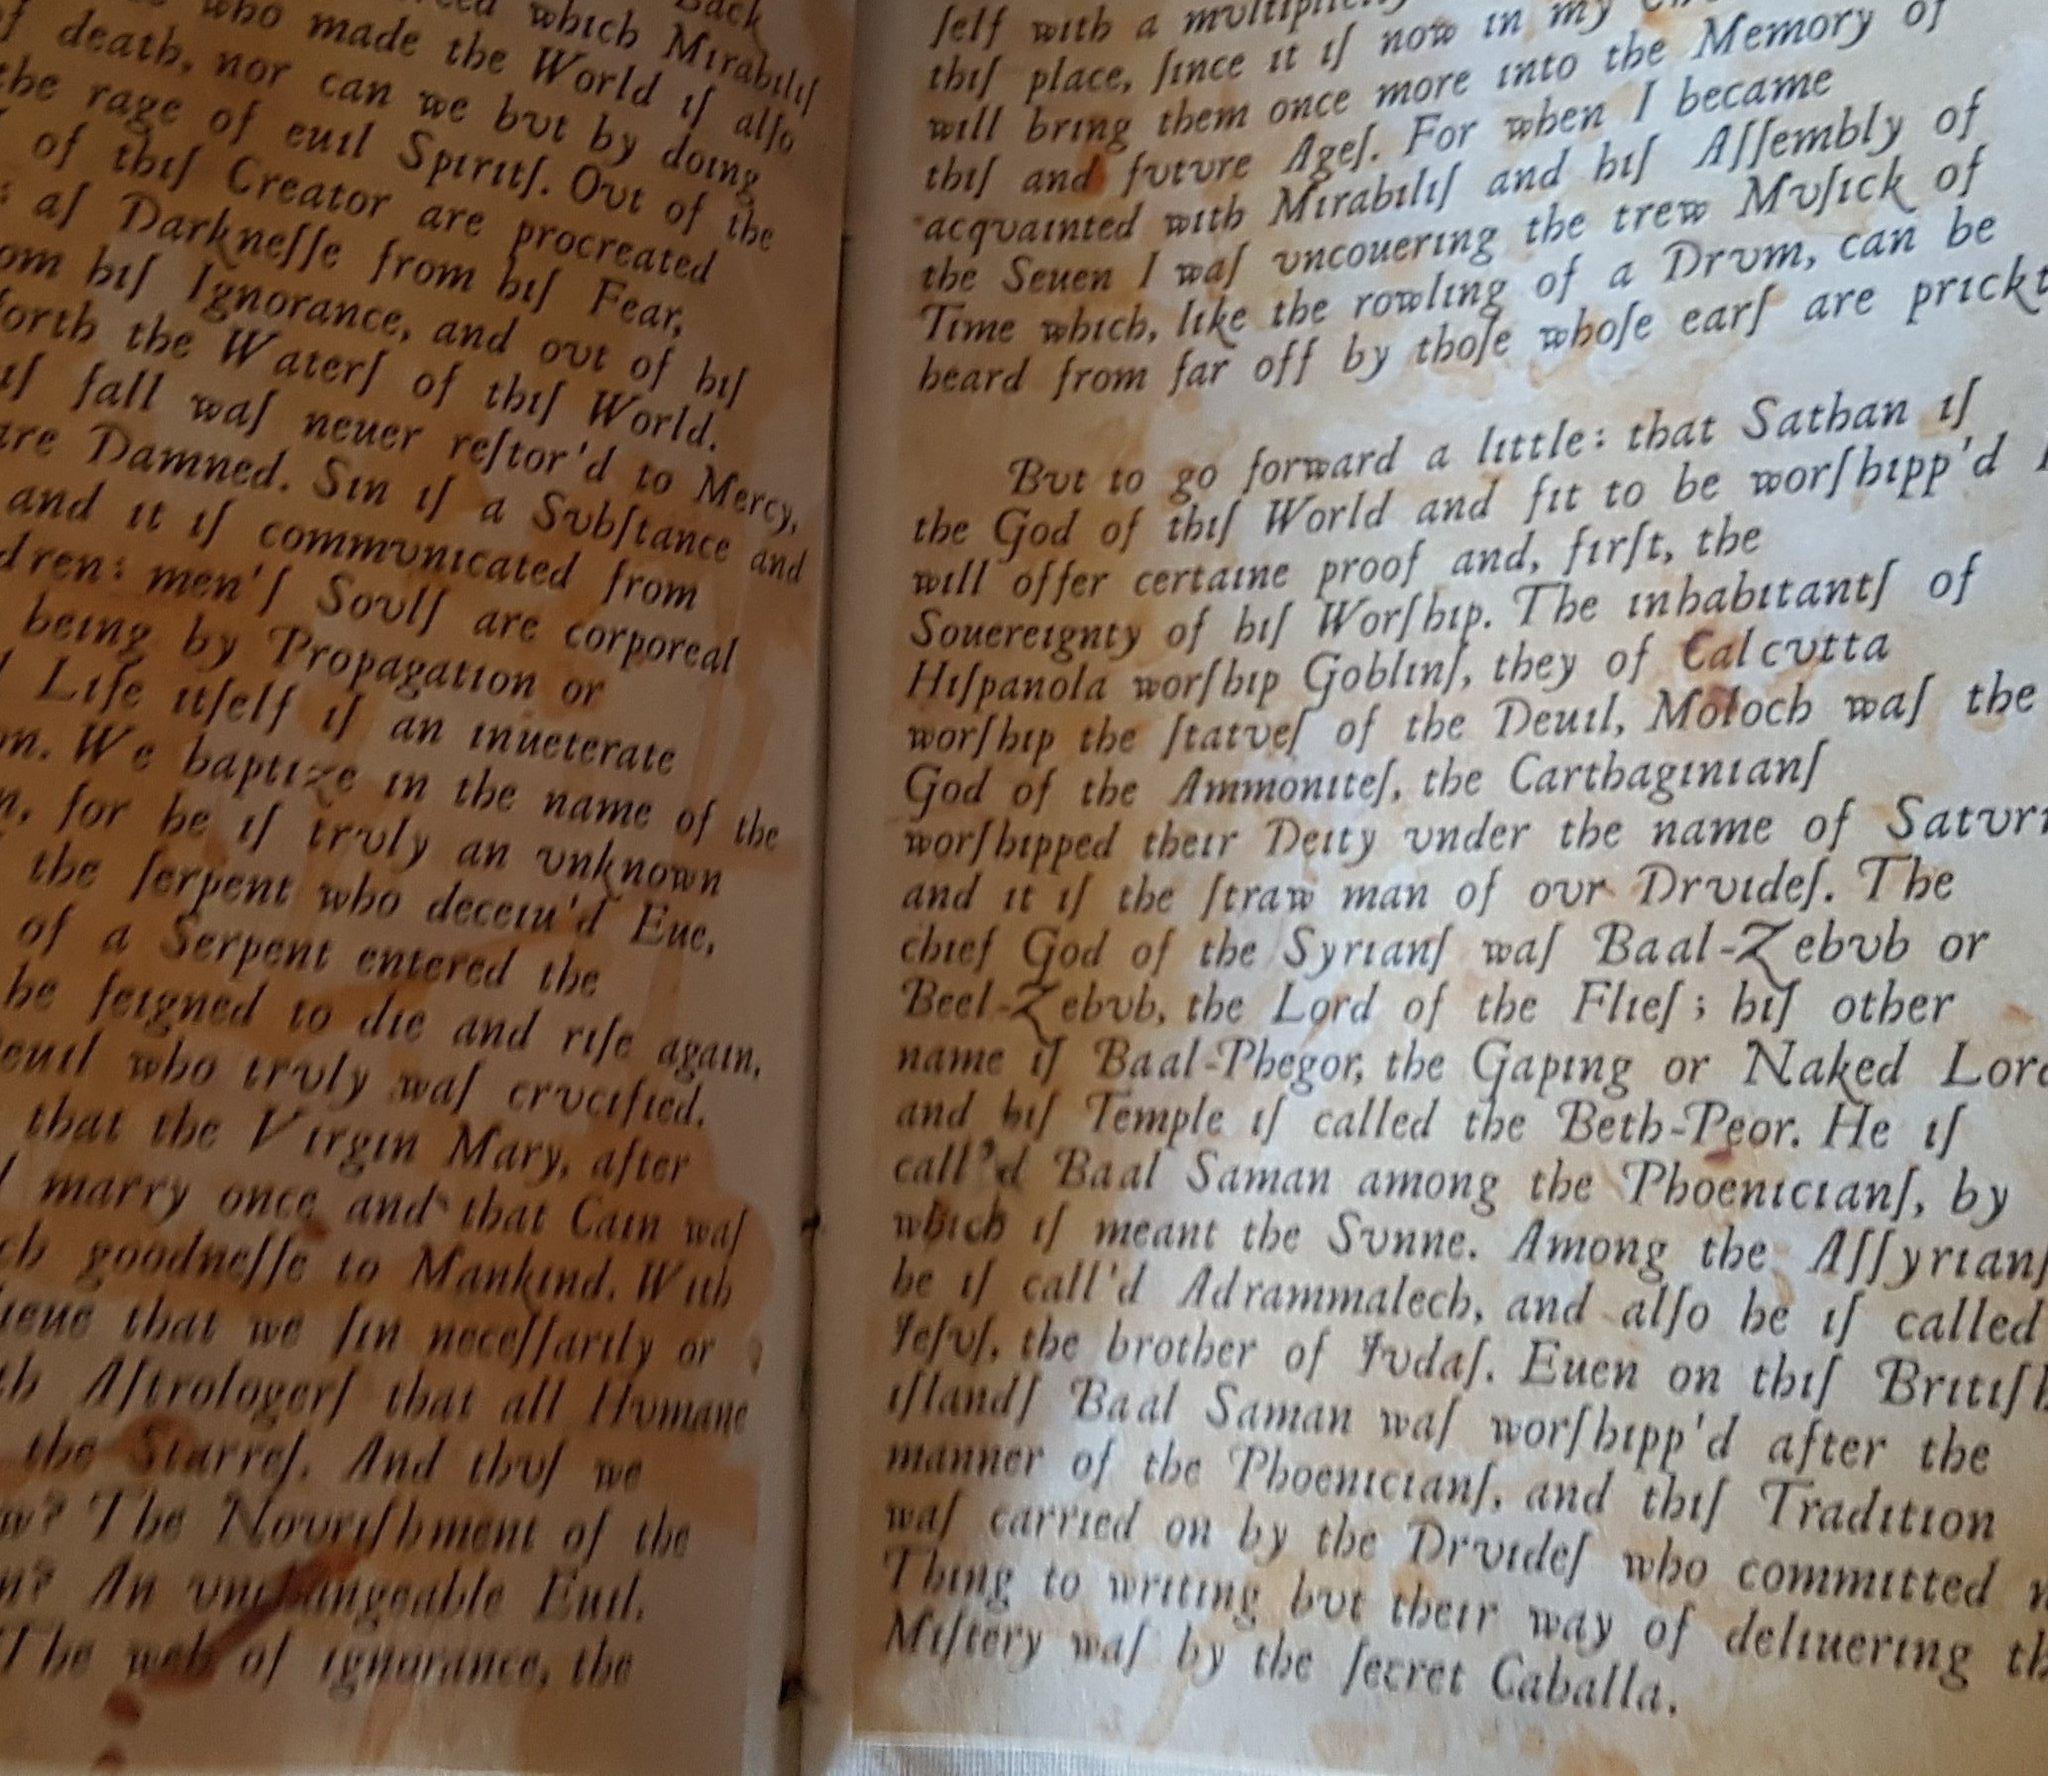 These blasphemous writings were adapted from passages in Peter Ackroyd's #Hawksmoor https://t.co/iQbAirnoVC